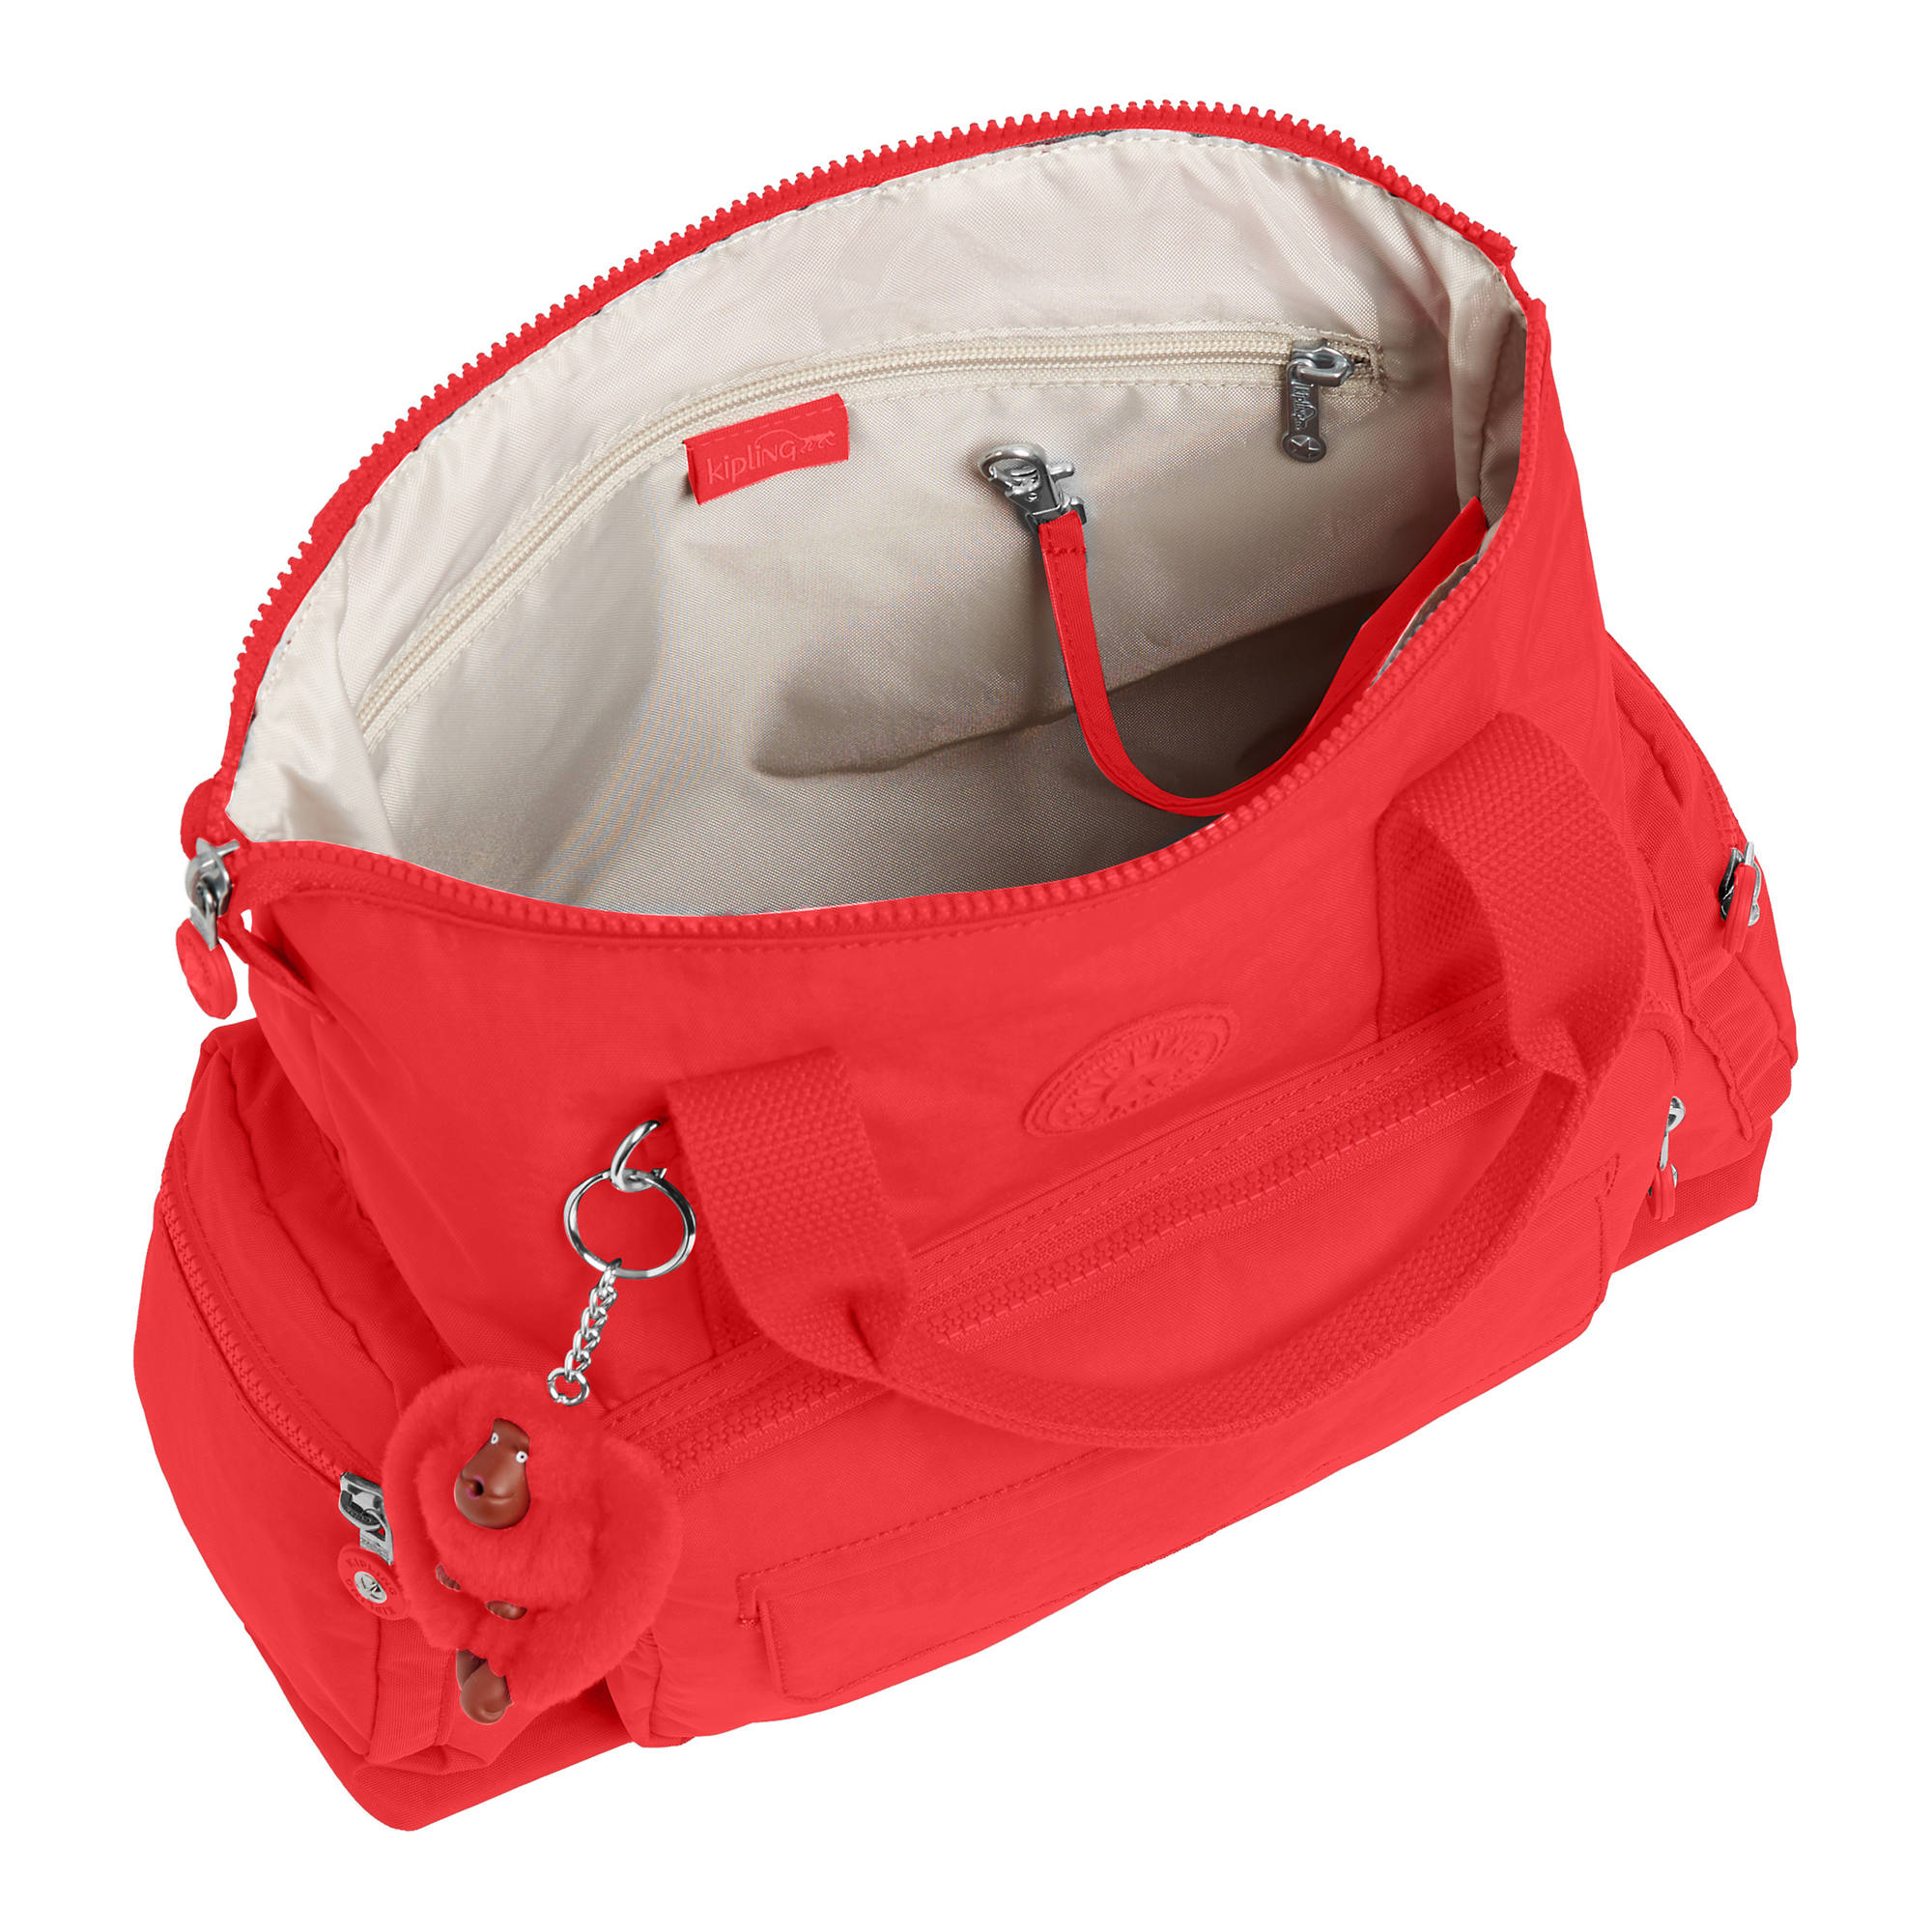 Kipling-Alvy-2-In-1-Convertible-Tote-Bag-Backpack miniatura 15